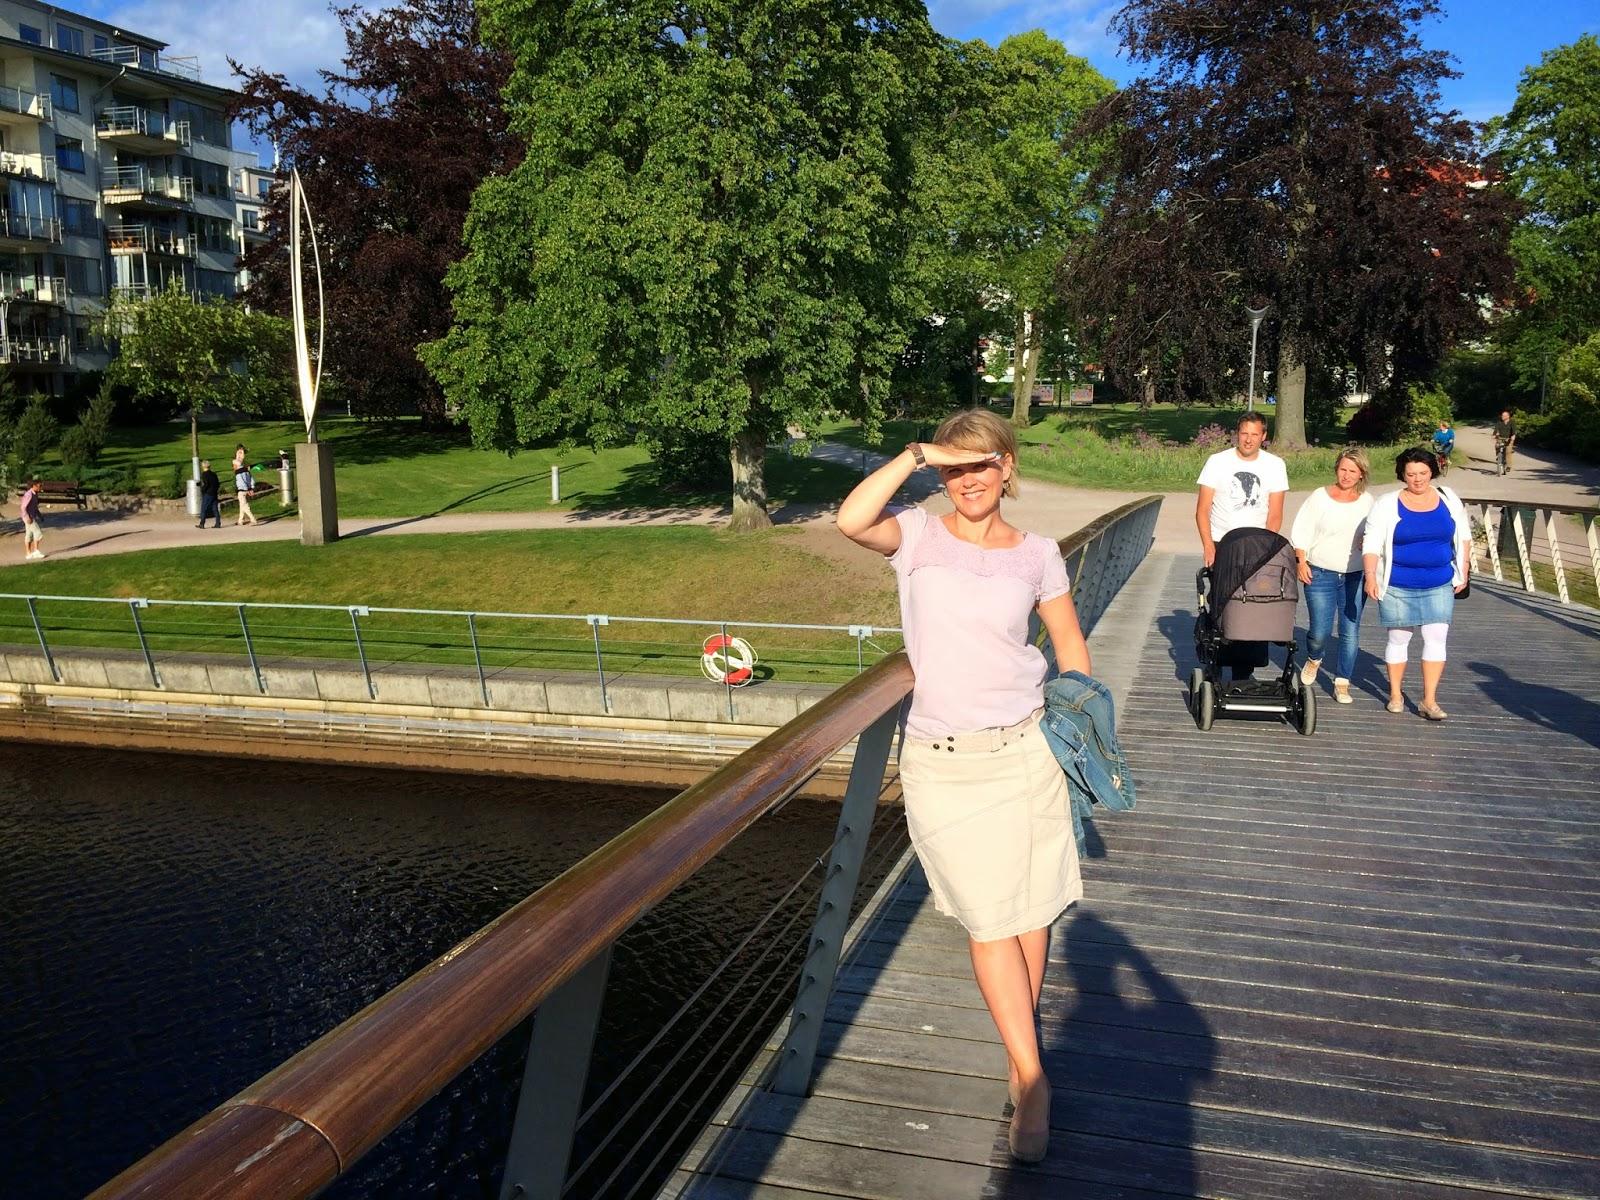 vart ska man gå på dejt i stockholm